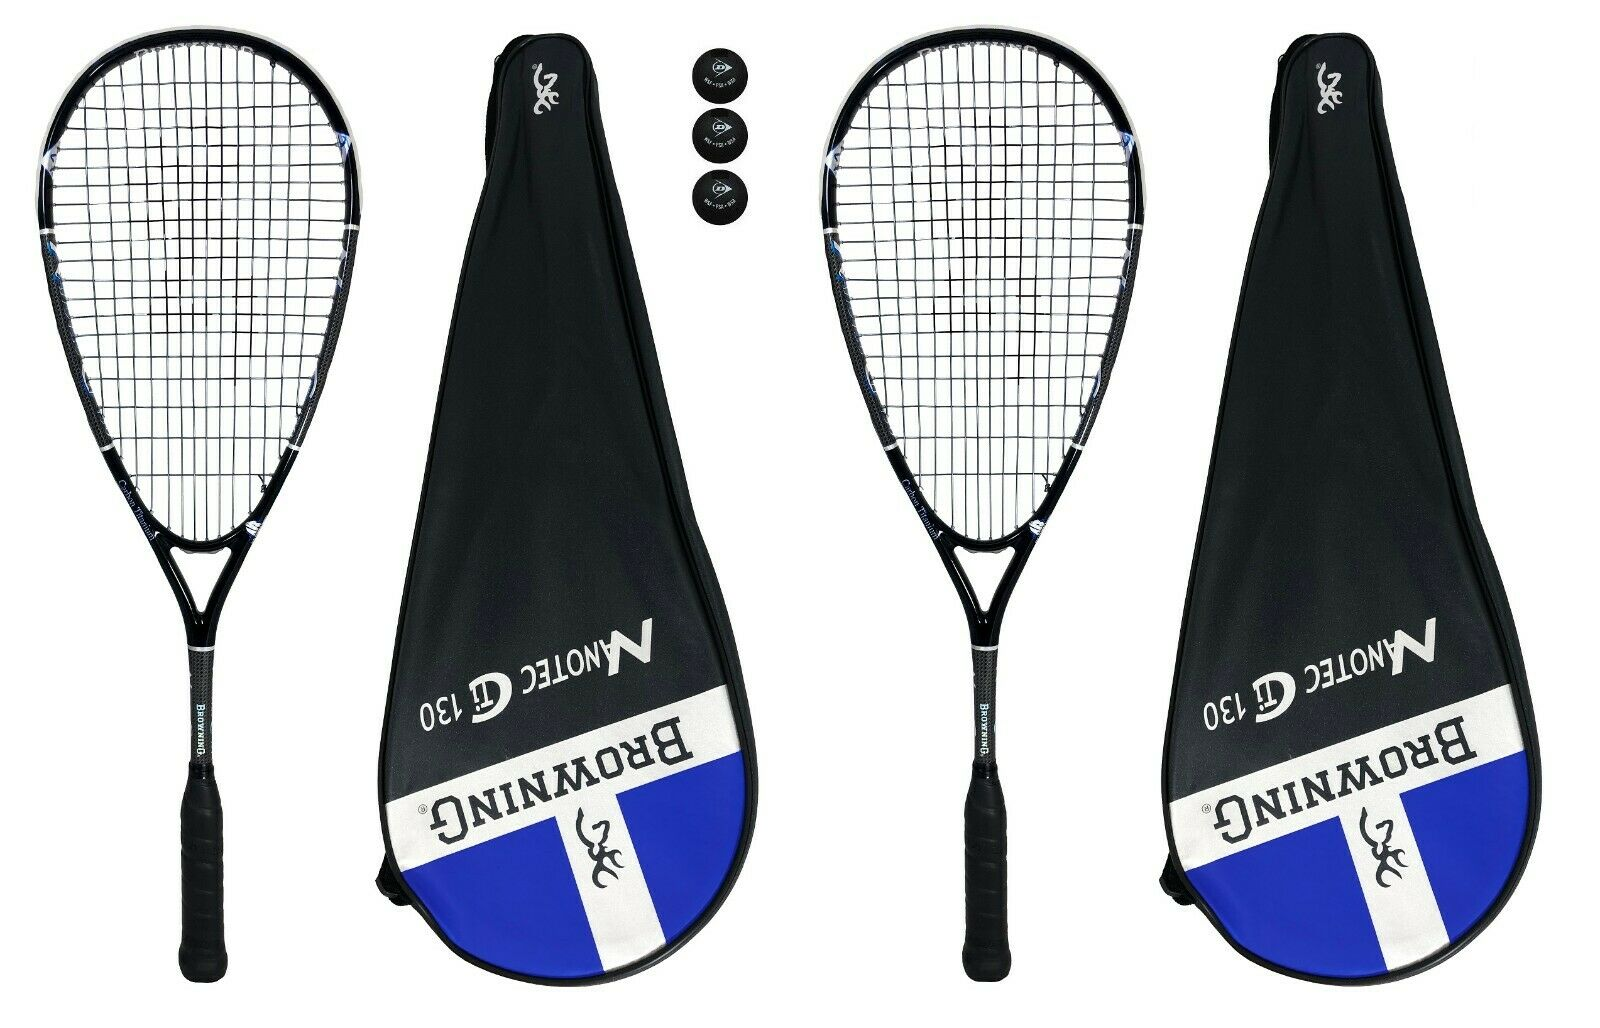 2 x brauning Nanotec Ti 130 Squash Rackets + 3 Squash Balls